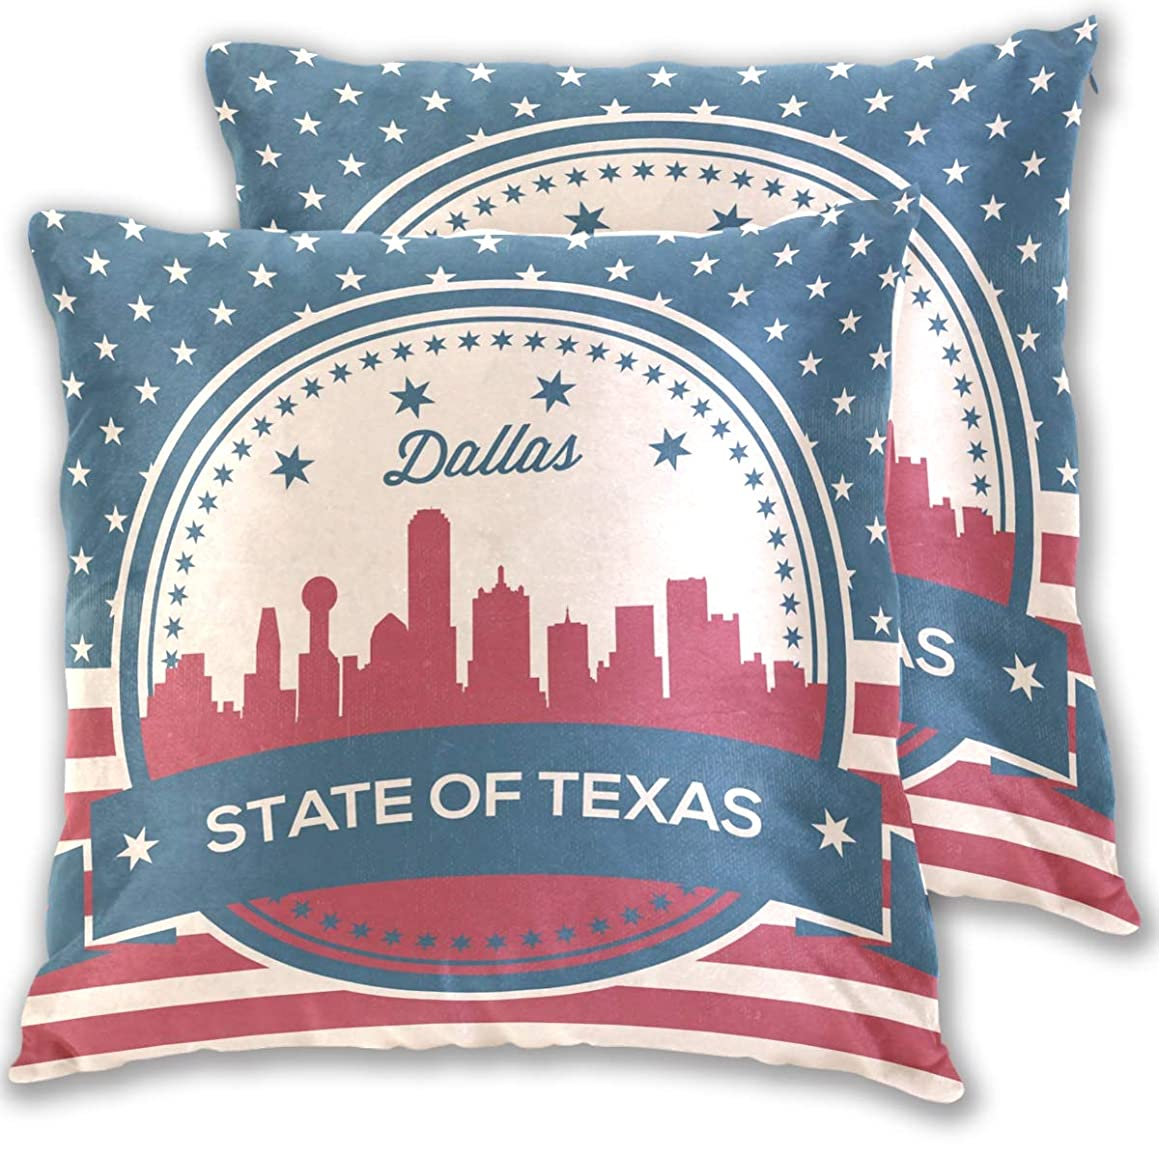 Franzibla Texas State Dallas Skyline Cotton Pillowcases Set of 2,18 X 18 Inch Pillow case